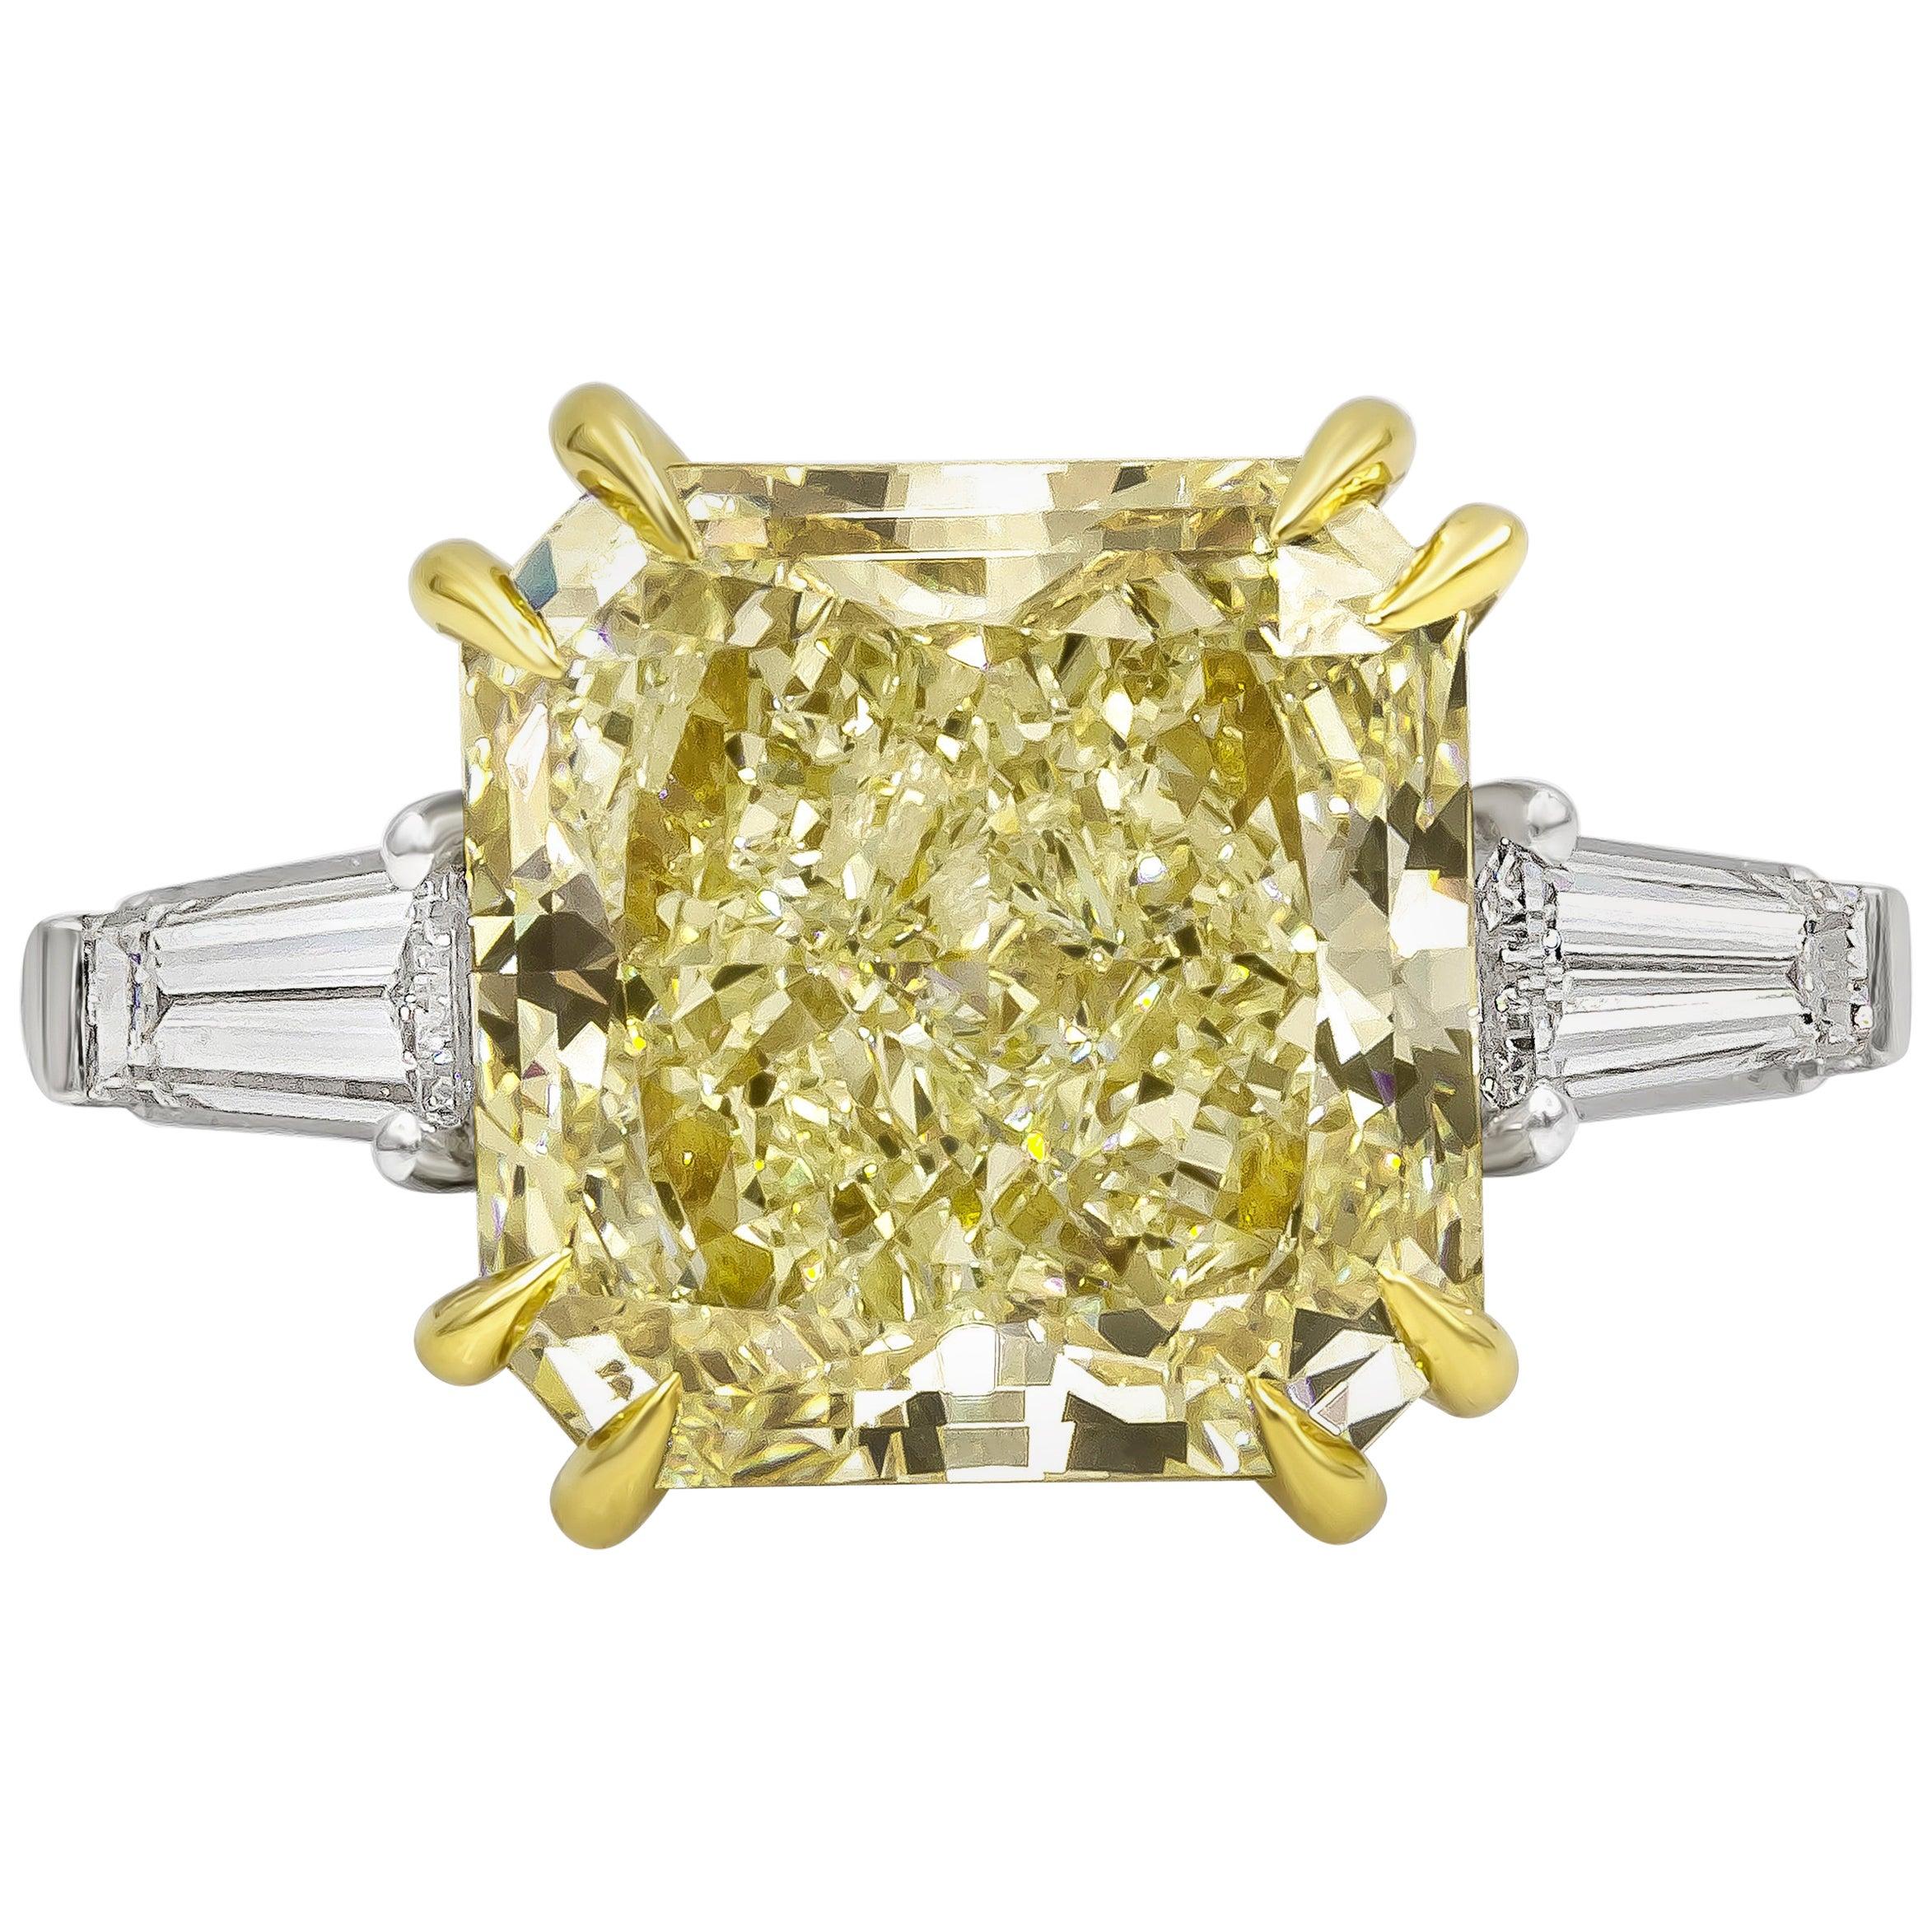 GIA Certified 10 Carat Radiant Cut Yellow Diamond Three-Stone Engagement Ring